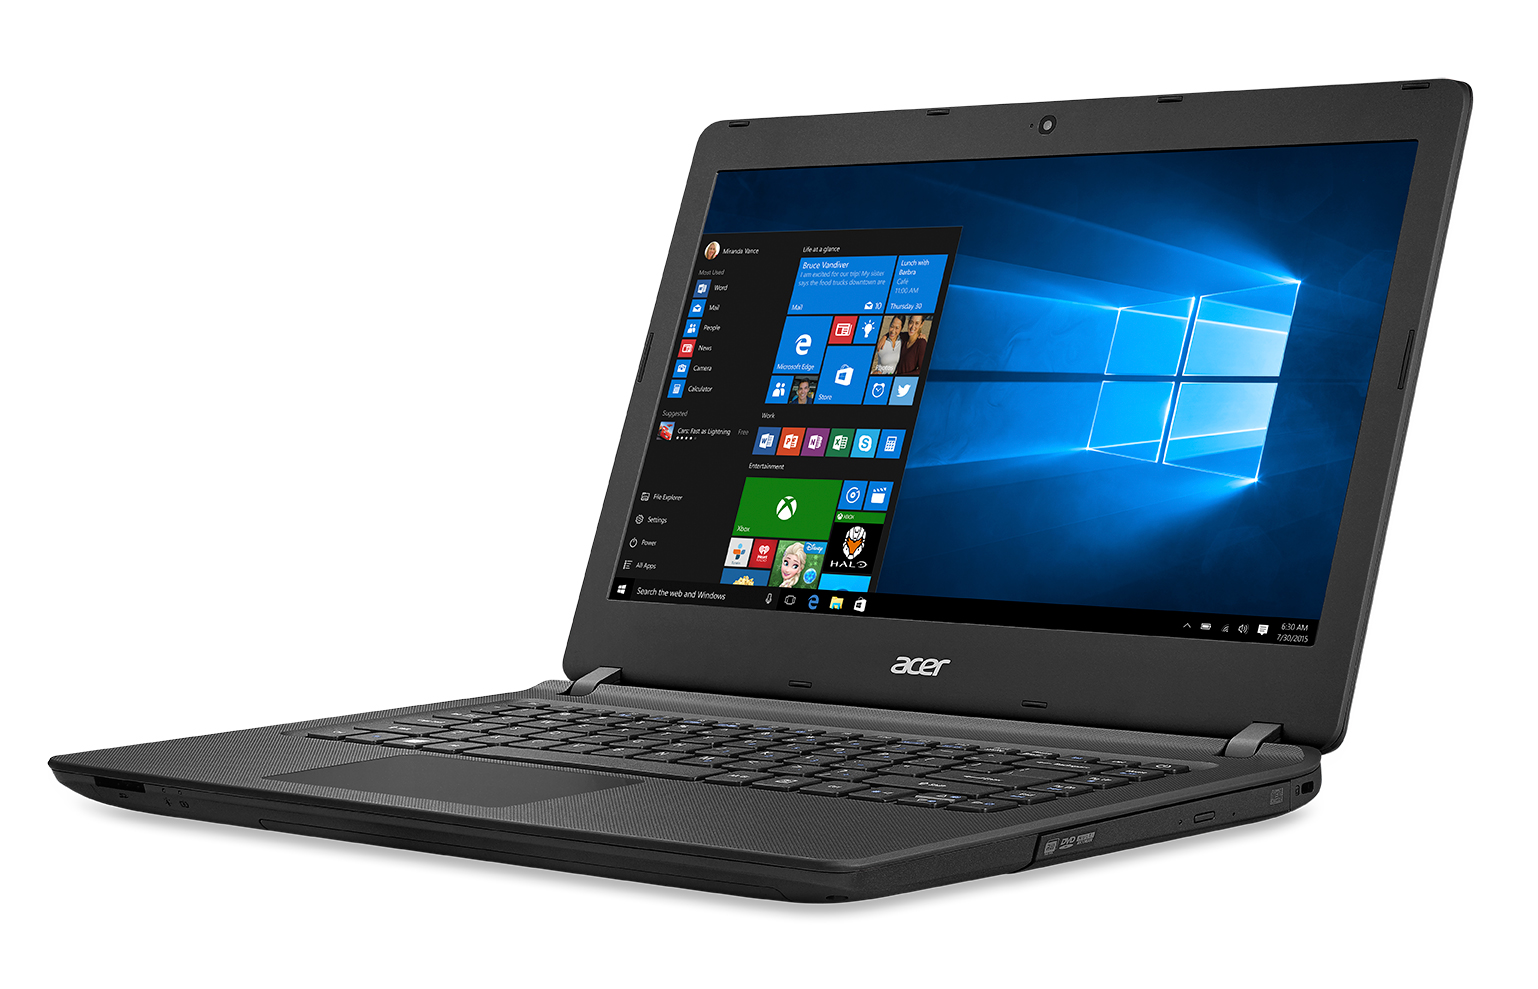 Лаптоп Acer Aspire ES1-432-C42P, NX.GGMEX.012